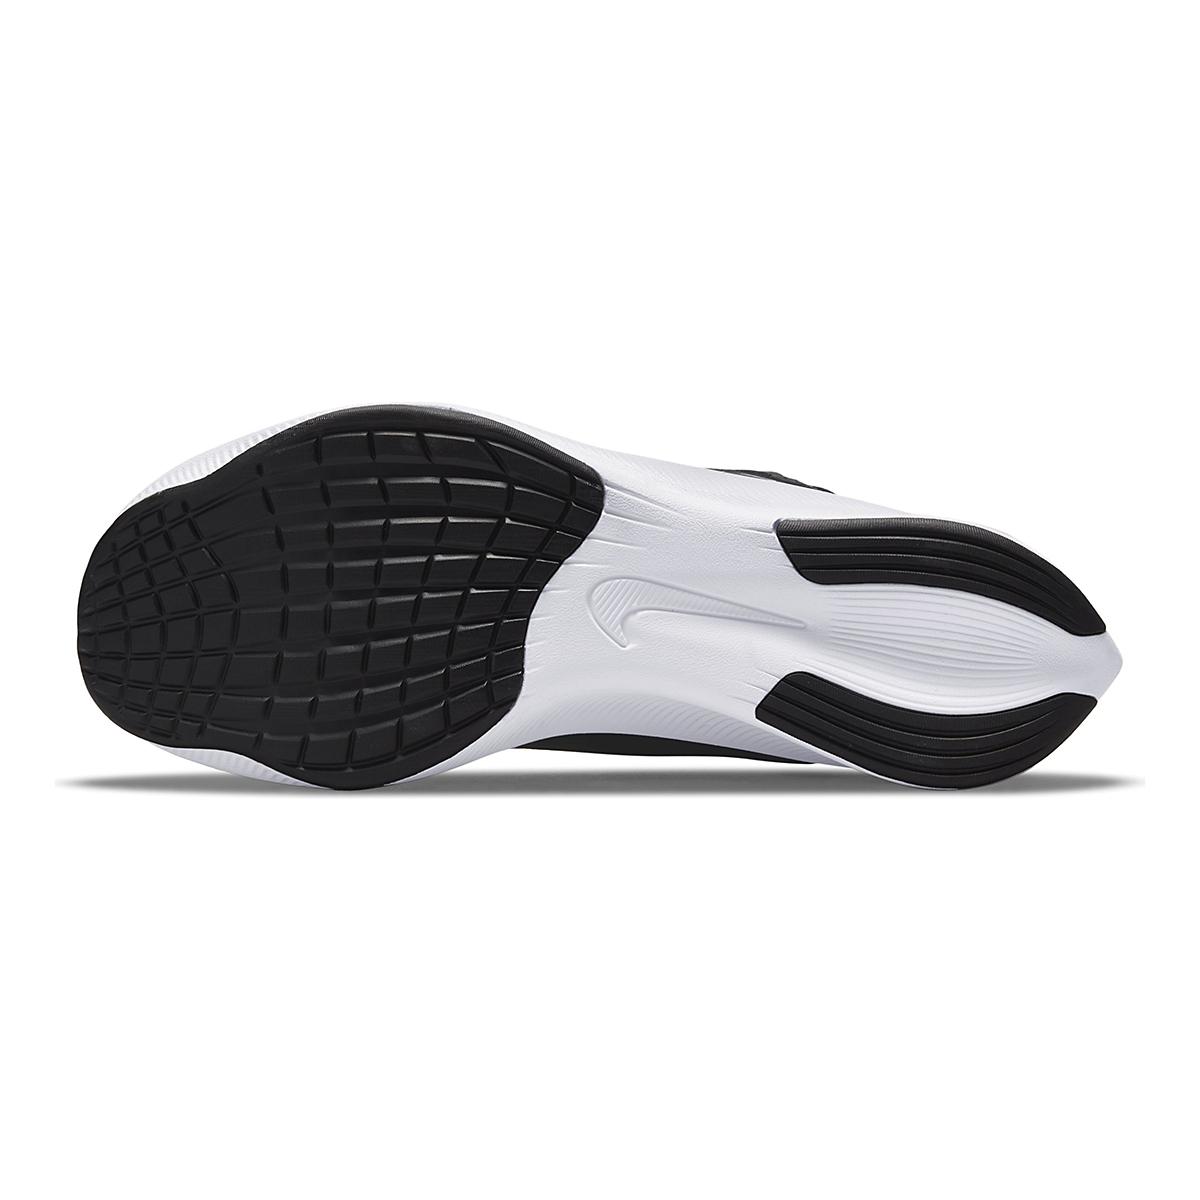 Men's Nike Zoom Fly 4 Running Shoe - Color: Black/White/Anthracite/Racer Blue - Size: 6 - Width: Regular, Black/White/Anthracite/Racer Blue, large, image 3